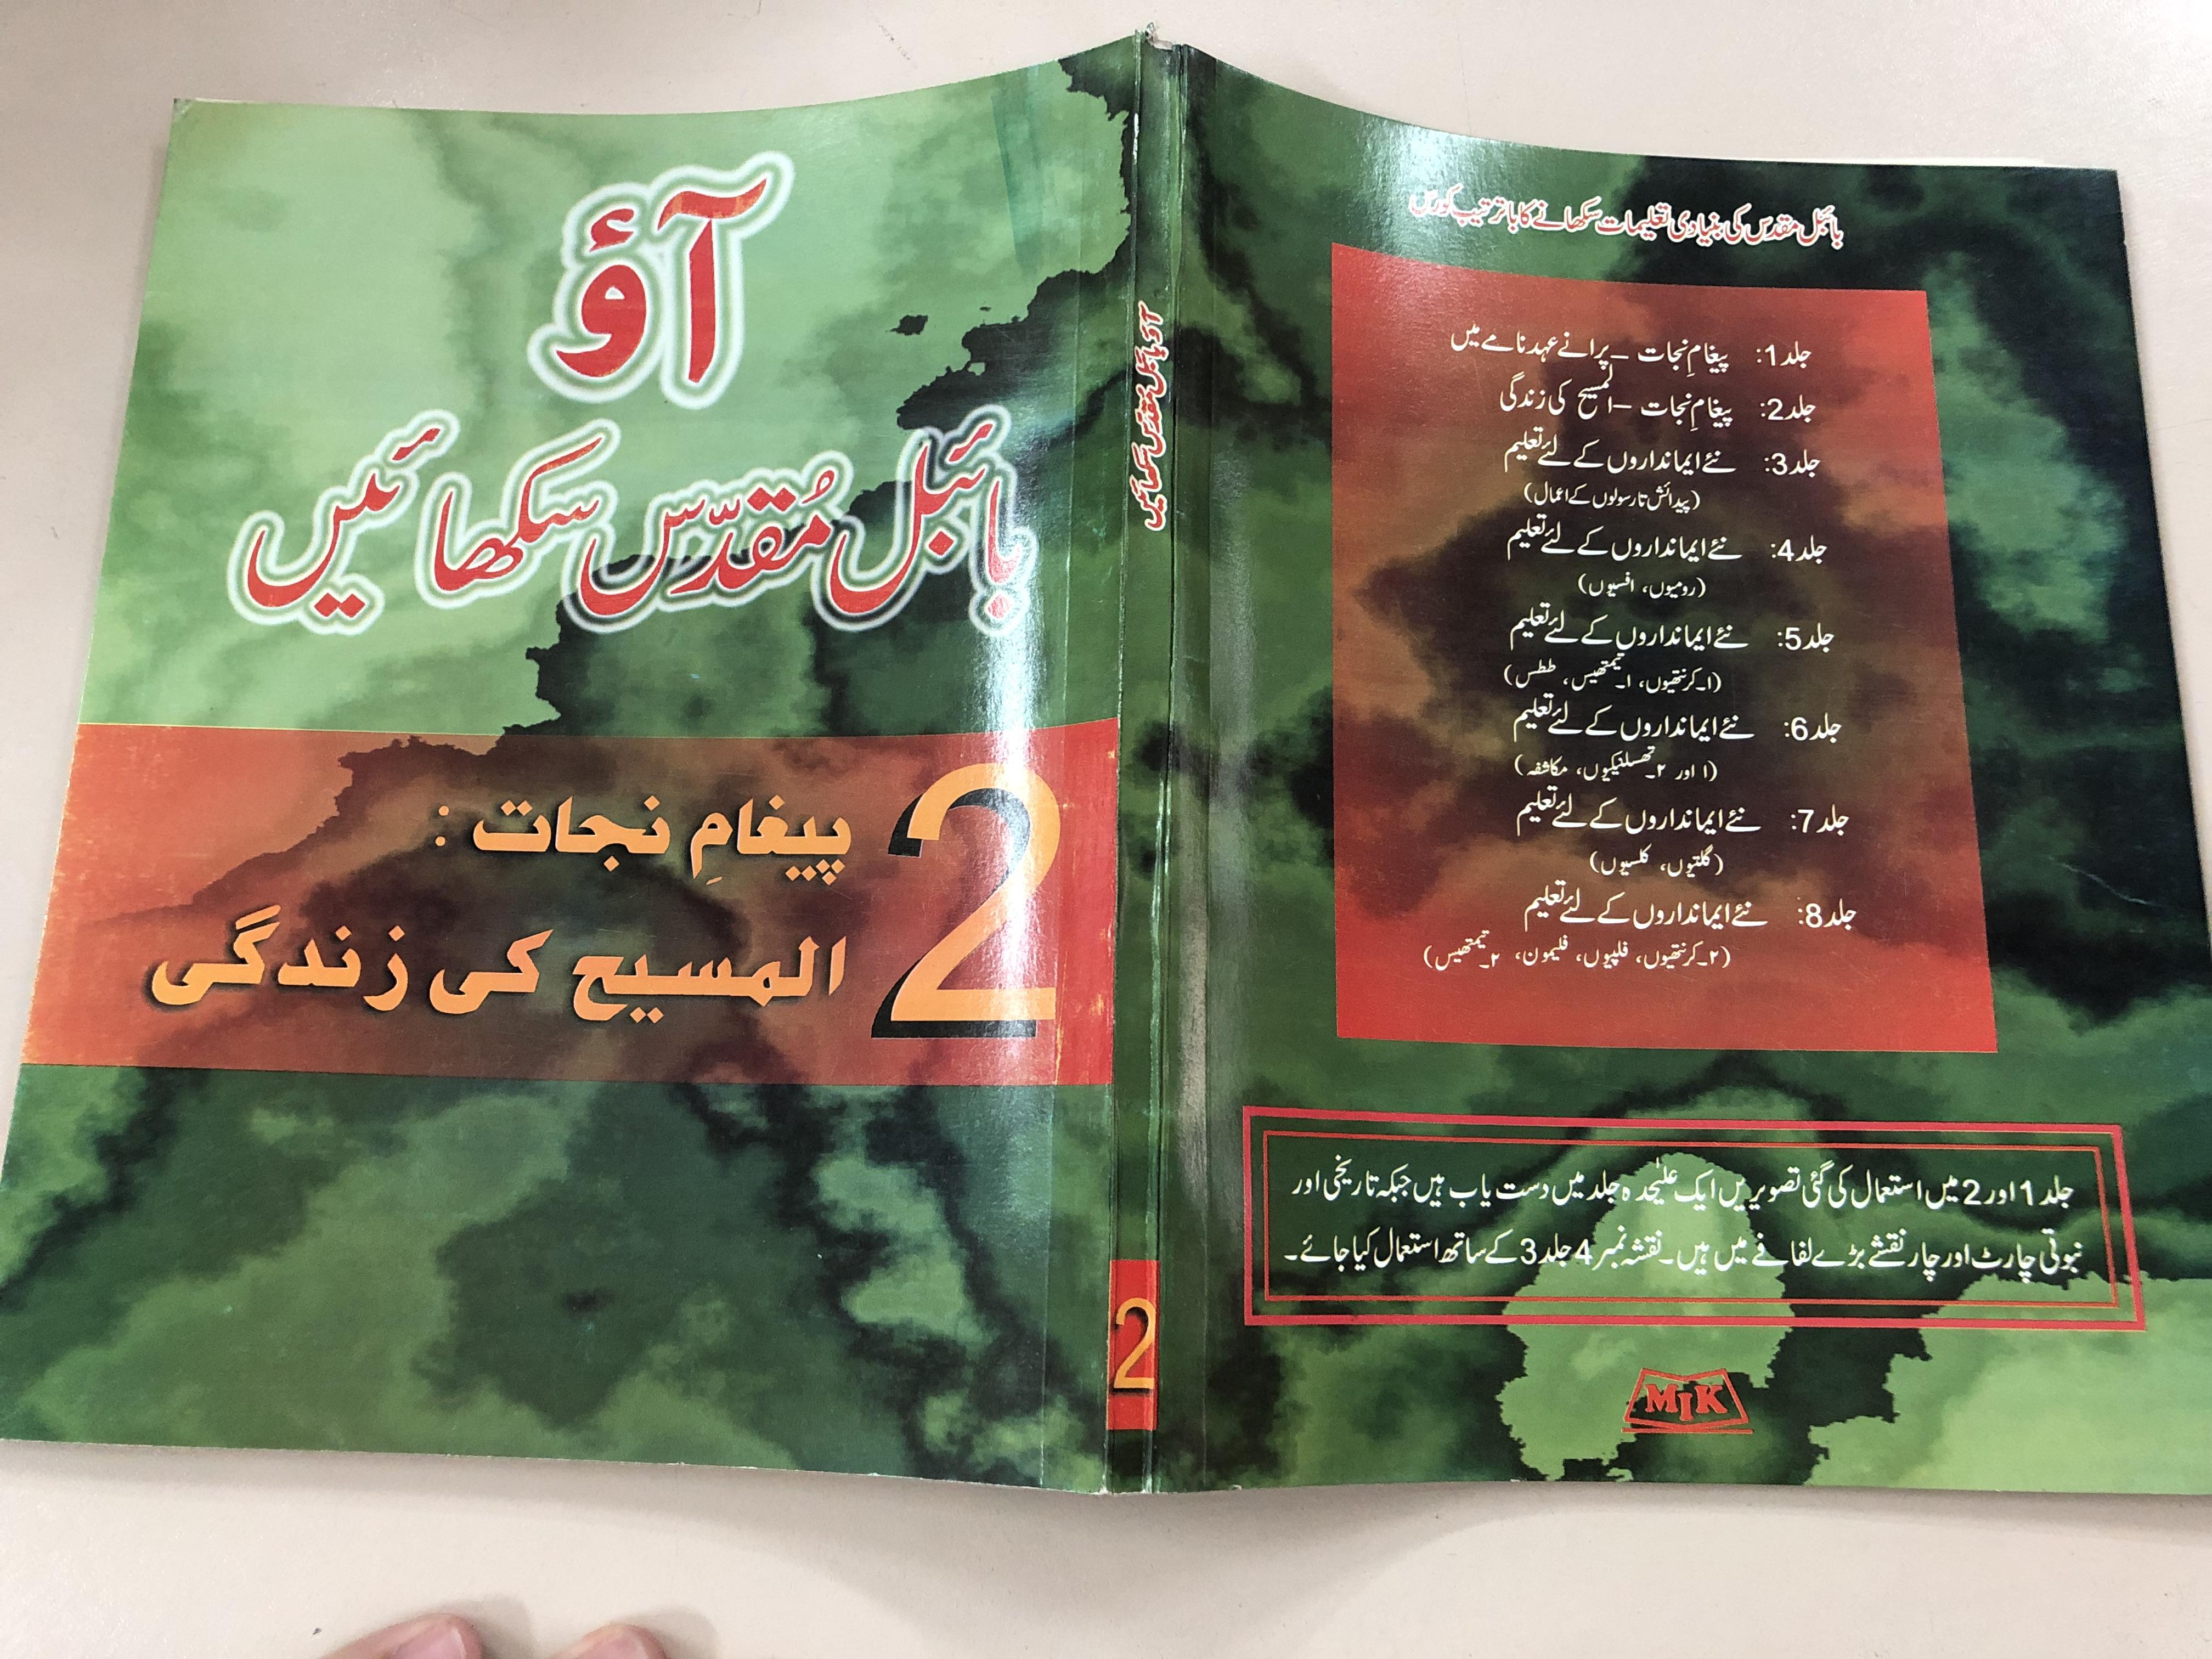 building-on-firm-foundations-vol.2-by-trevor-mcilwain-urdu-edition-evangelism-the-old-testament-pakistan-2007-13-.jpg